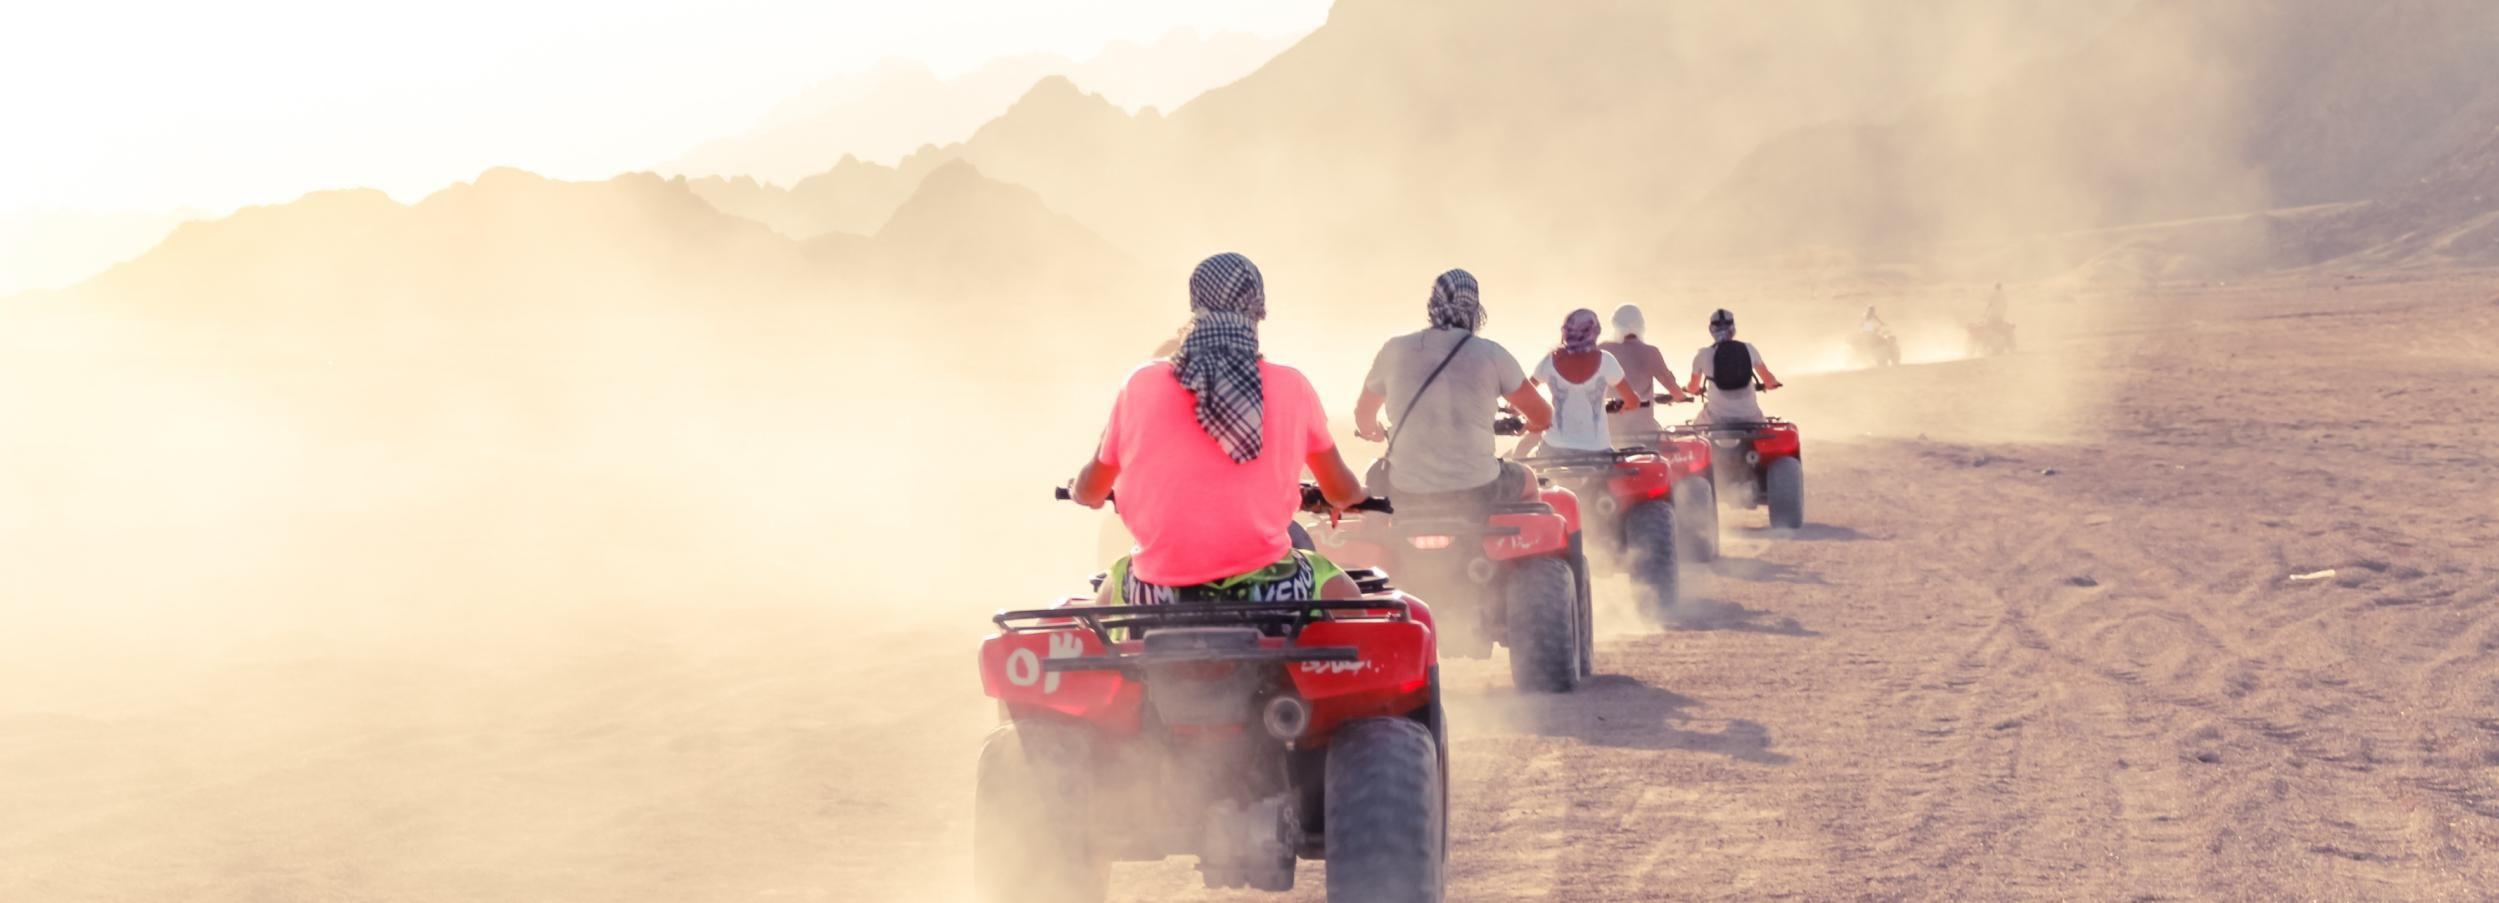 Sharm El Sheikh Desert Safari with Camel & Bike Rides